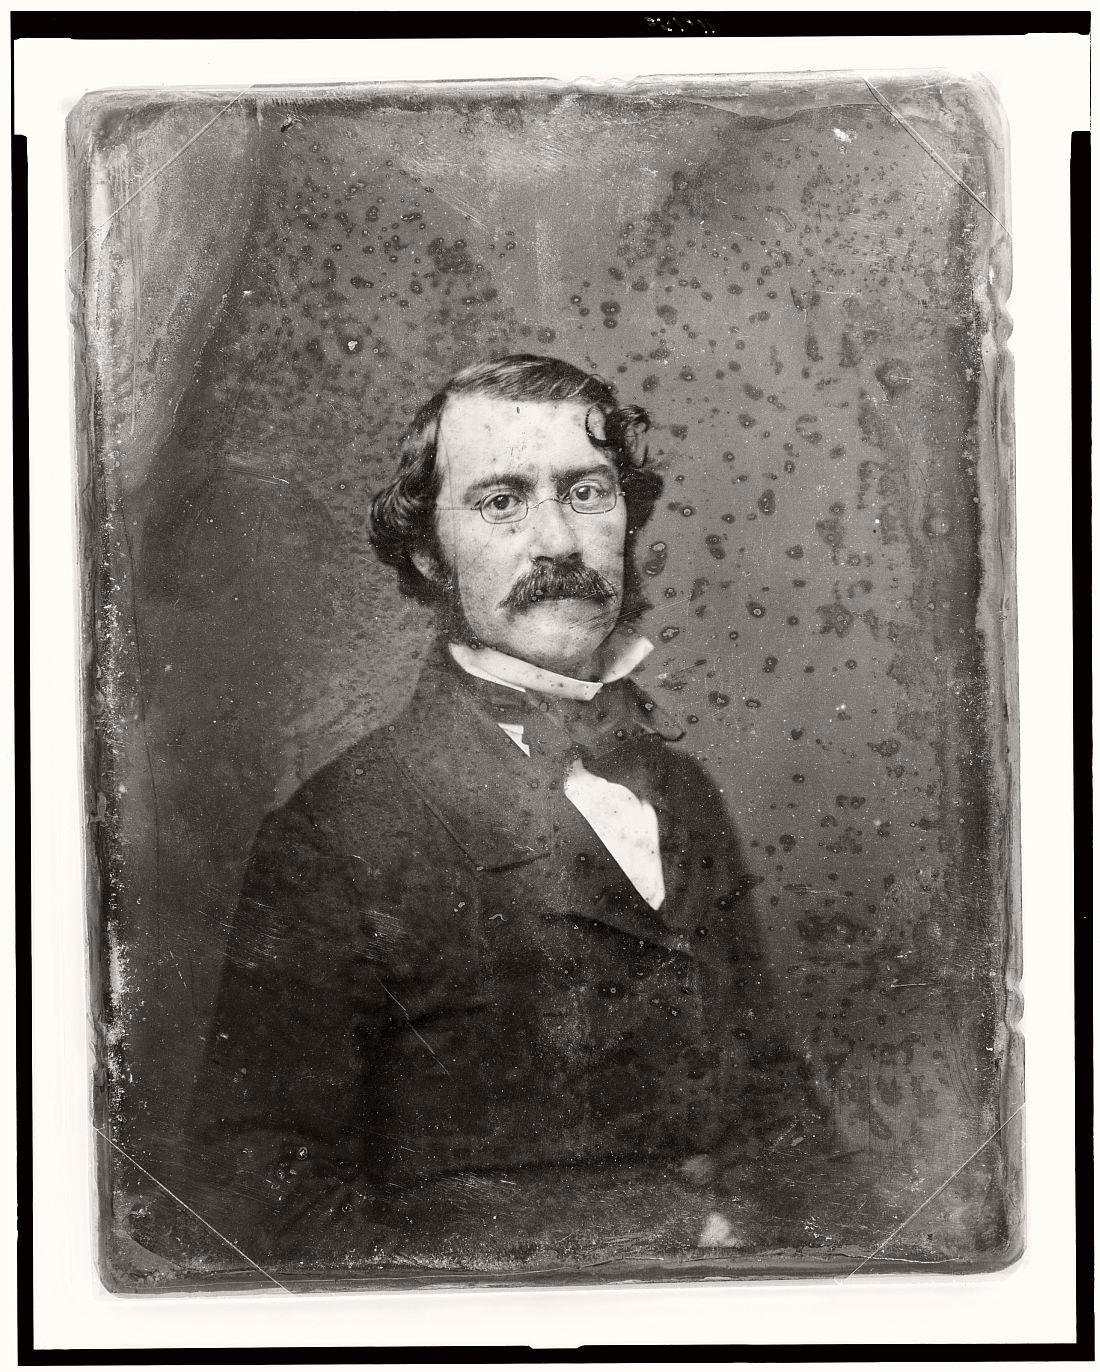 vintage-daguerreotype-portraits-from-xix-century-1844-1860-60